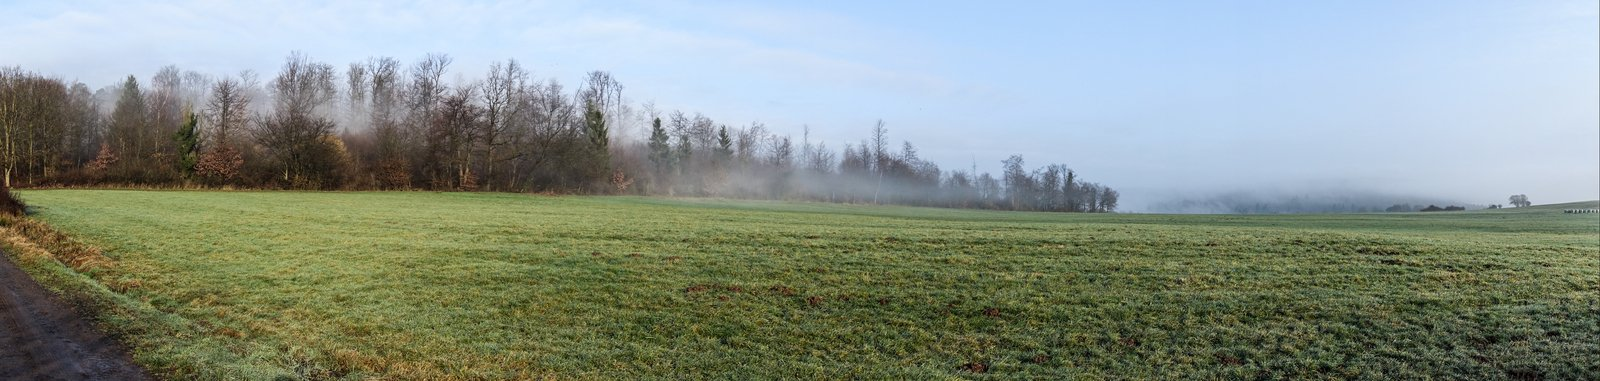 fog-landscape-panorama-1638847